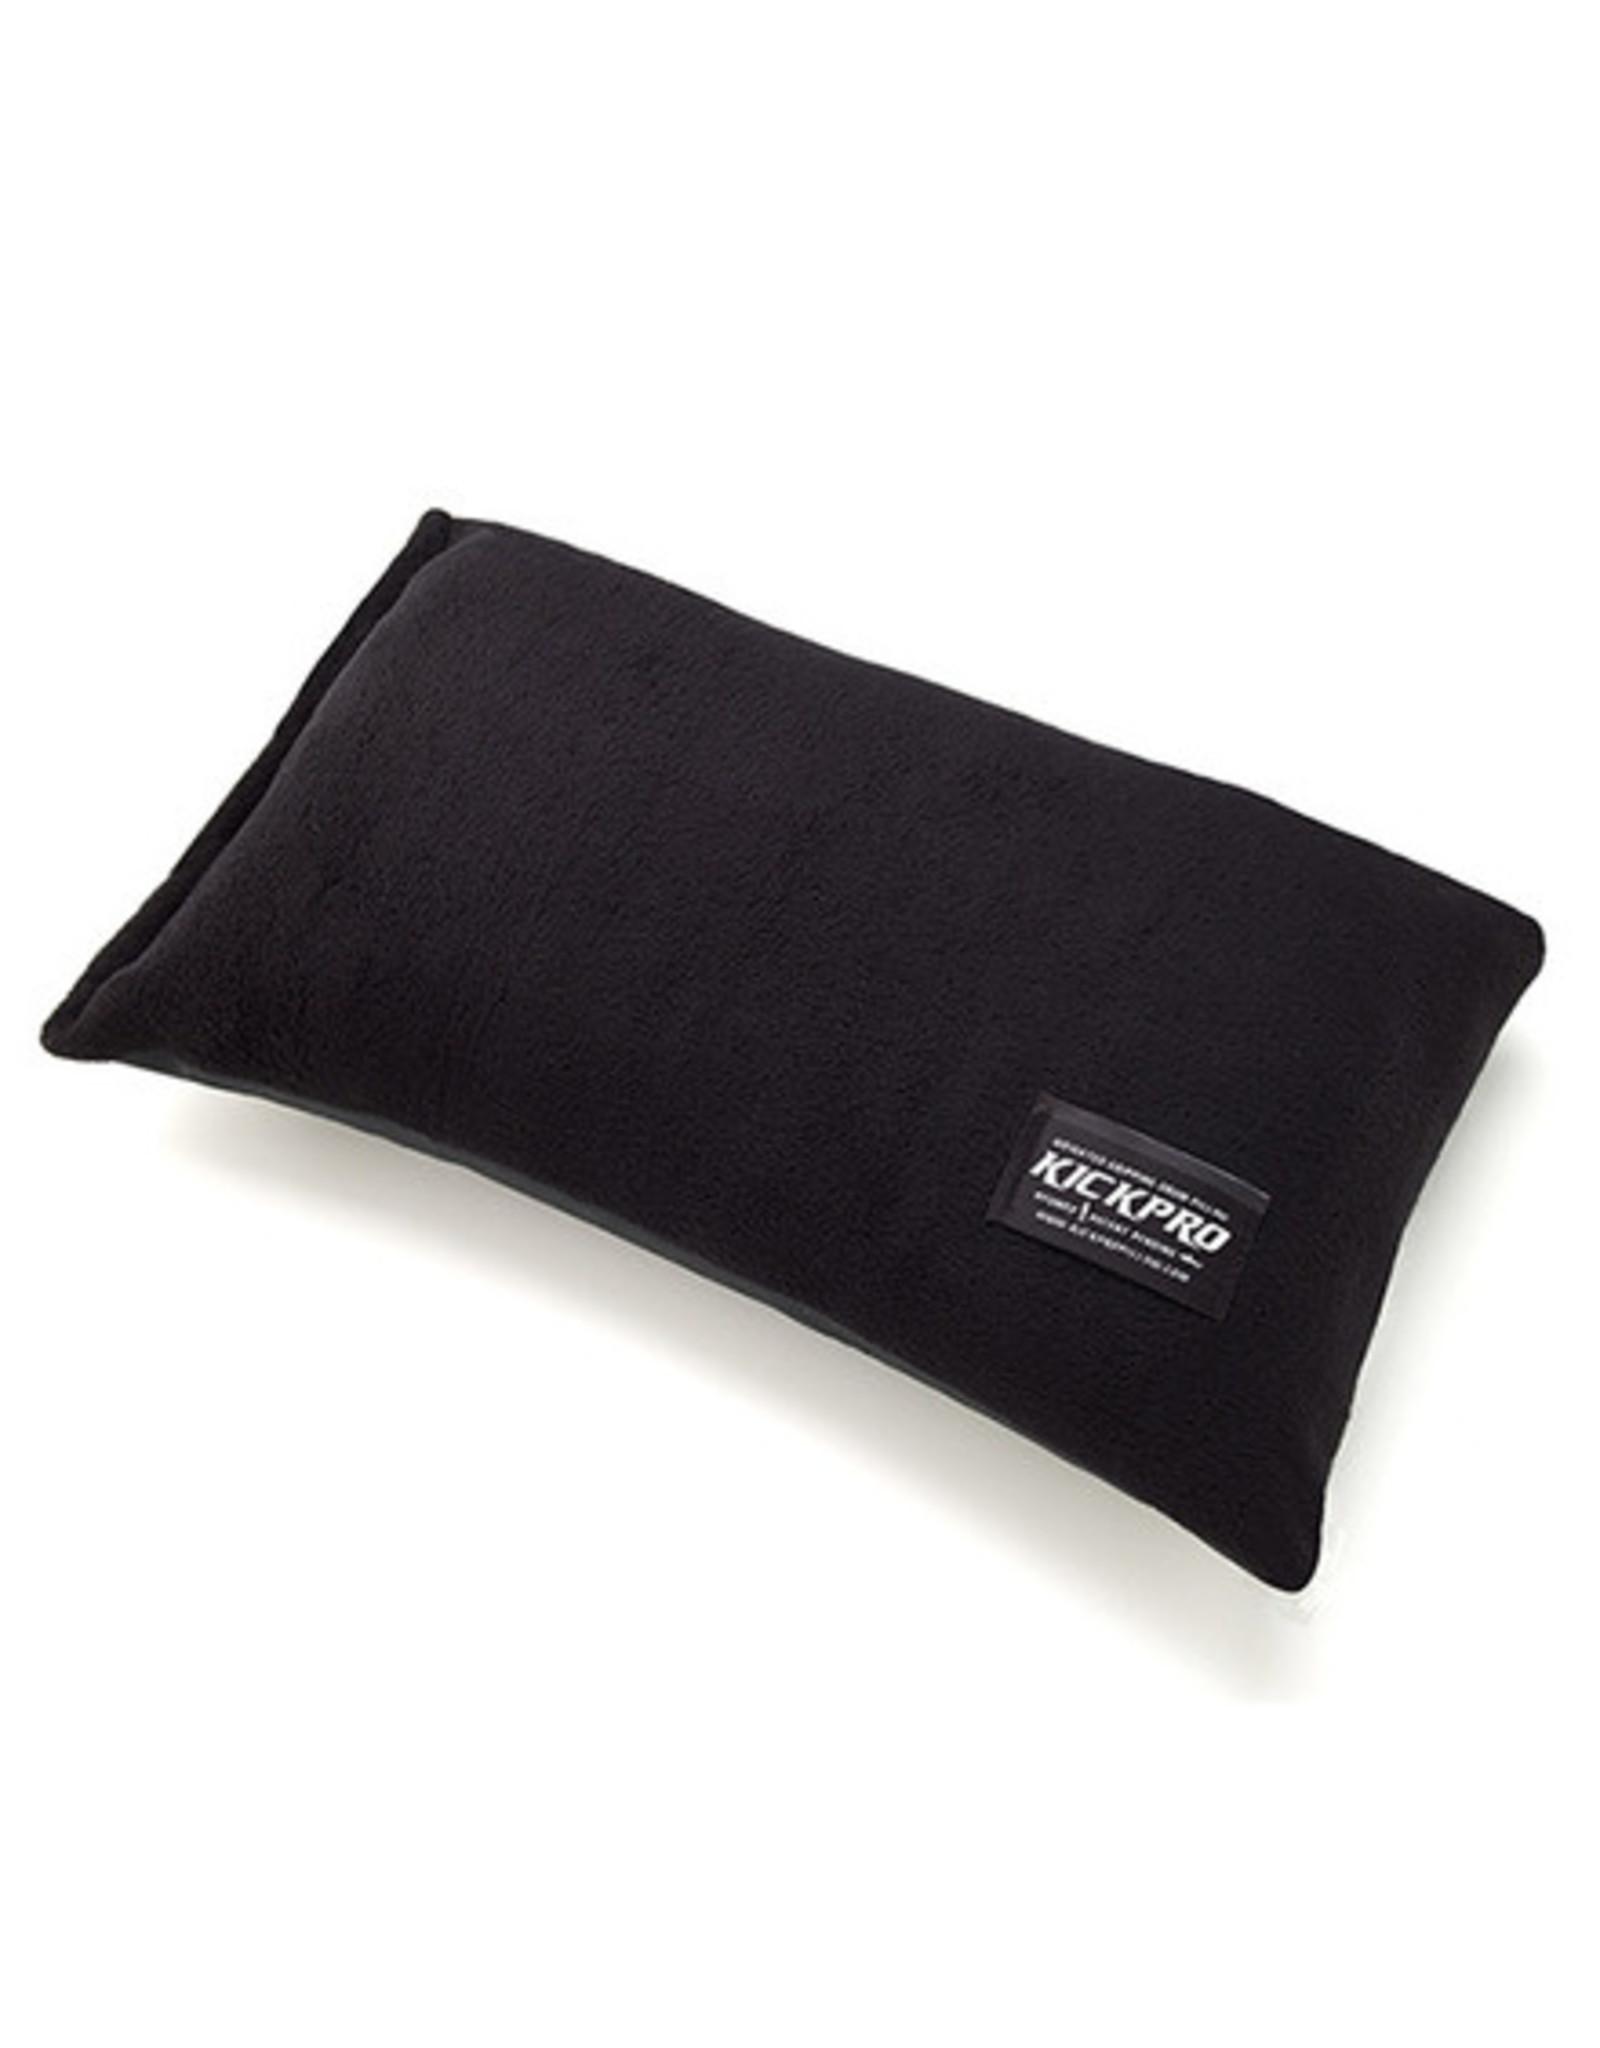 Big Bang Distribution Kick Pro Pillow